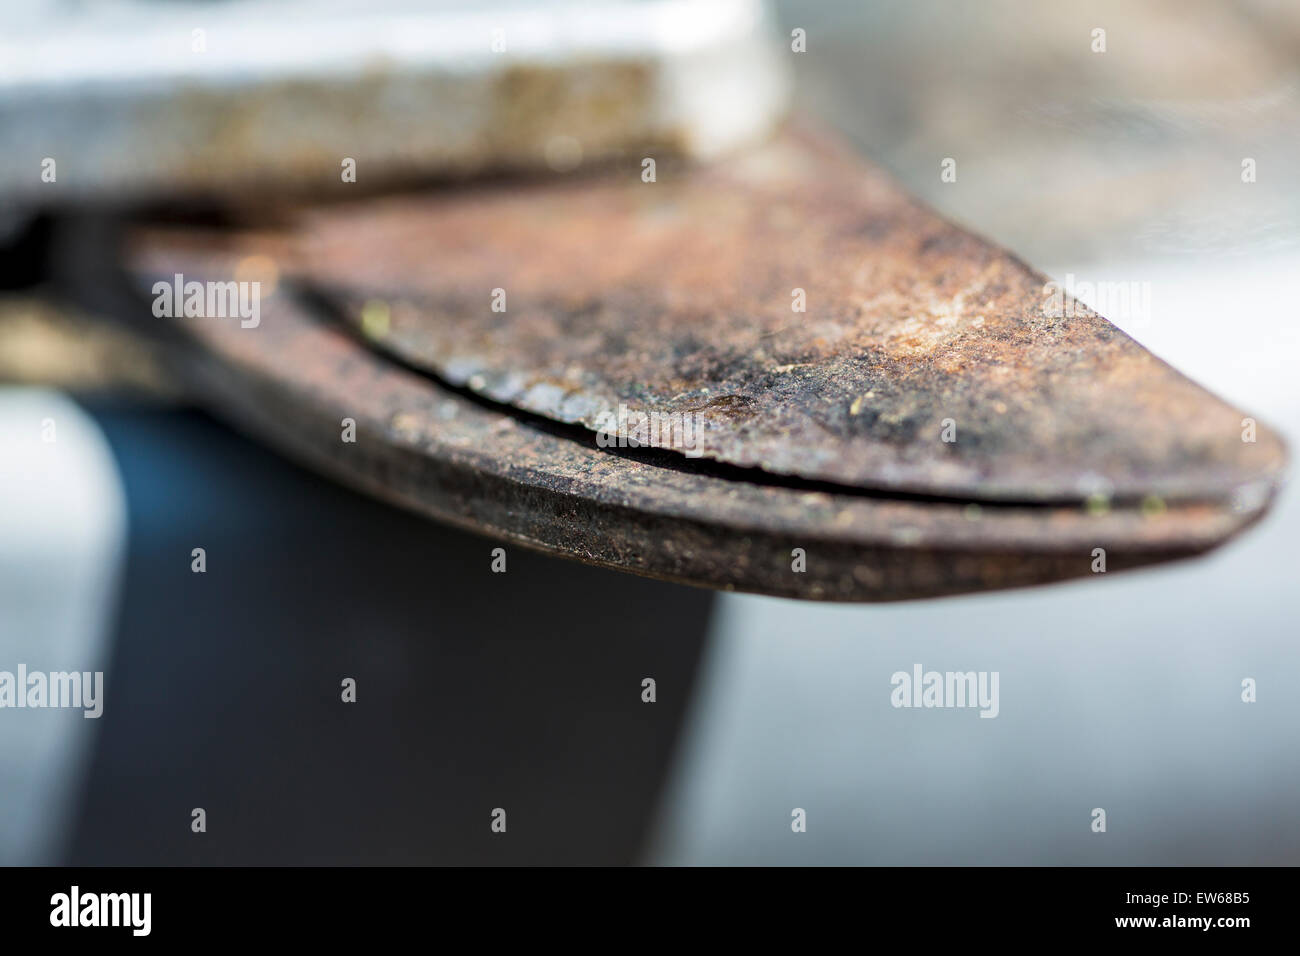 Rusty Steel Secateurs Blades - Stock Image